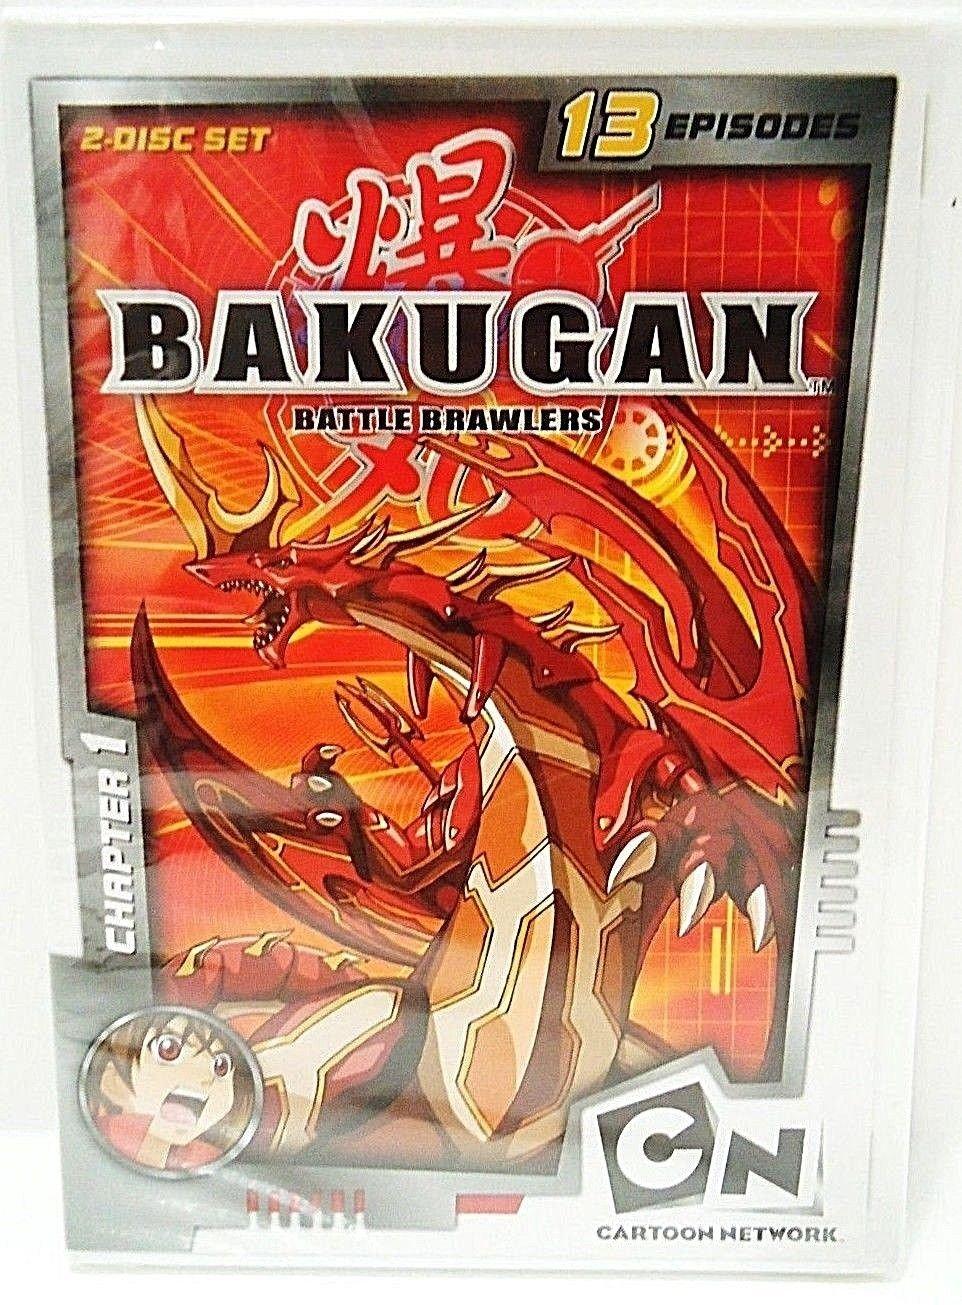 BAKUGAN - BATTLE BRAWLERS - DVD - CHAPTER 1 - 2 DISC SET - NEW - CARTOON - ANIME